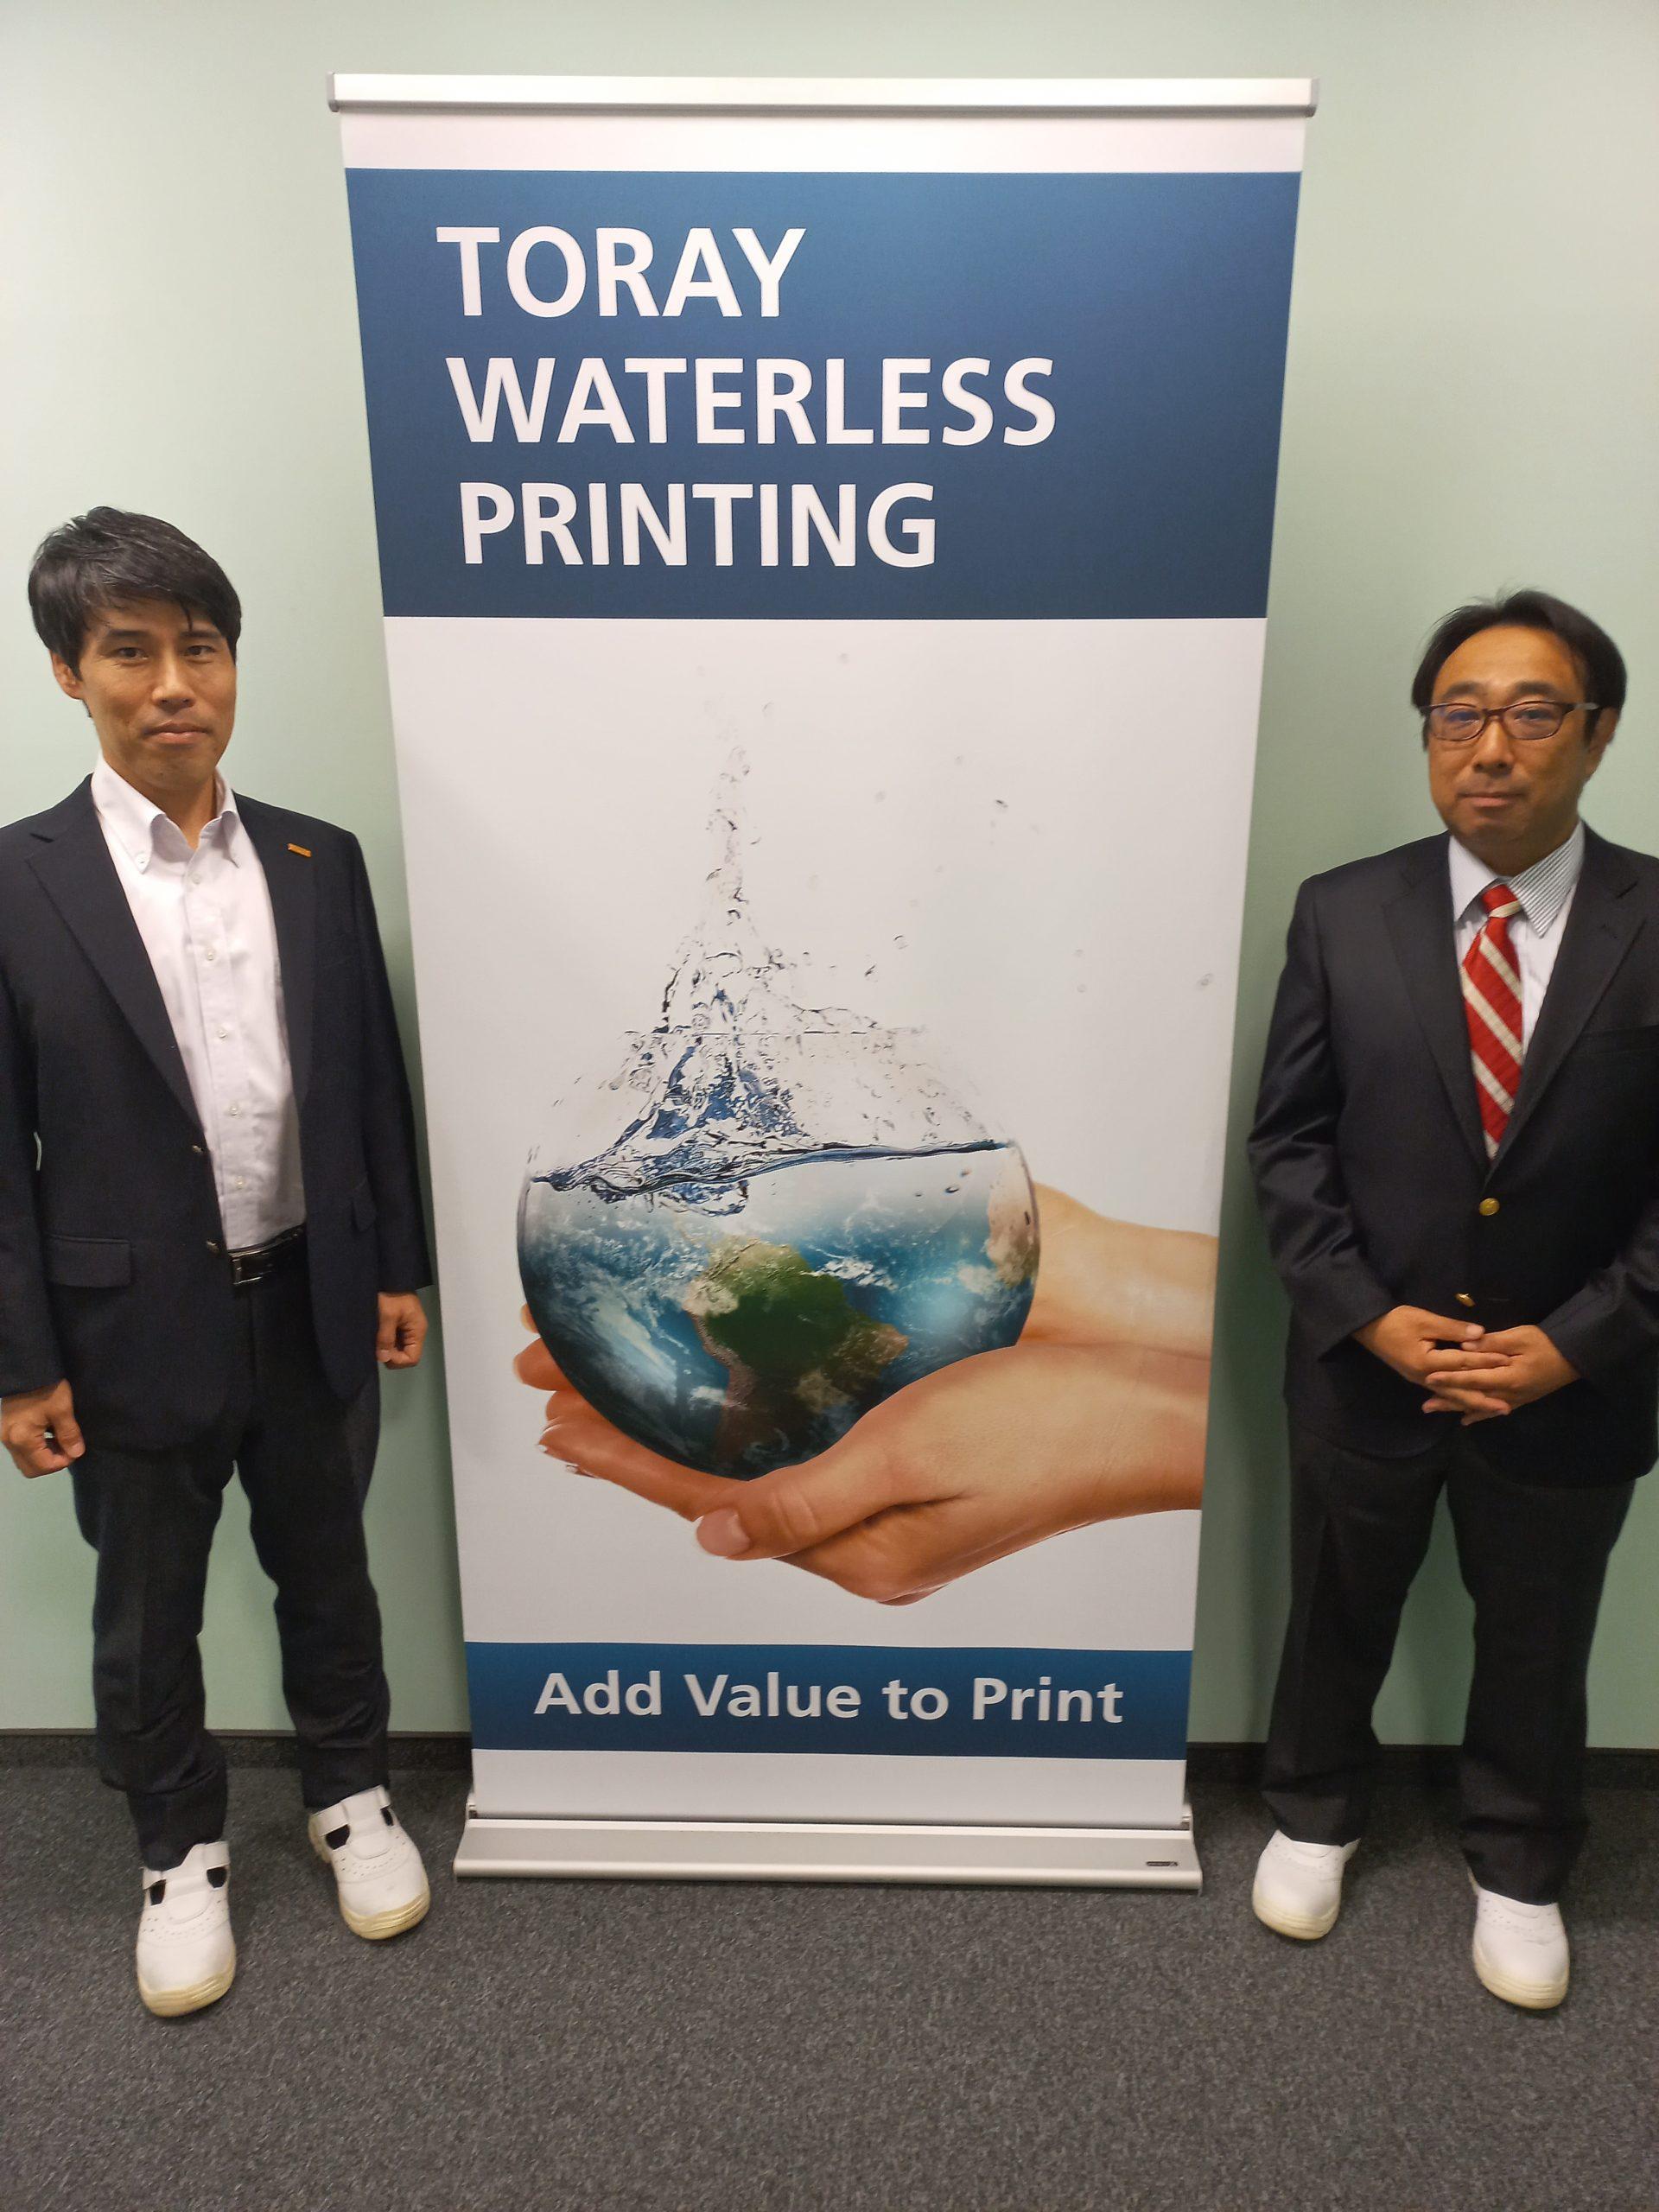 Mr. Kaoru Ueda and Mr. Junichi Ishii posing before a Toray banner